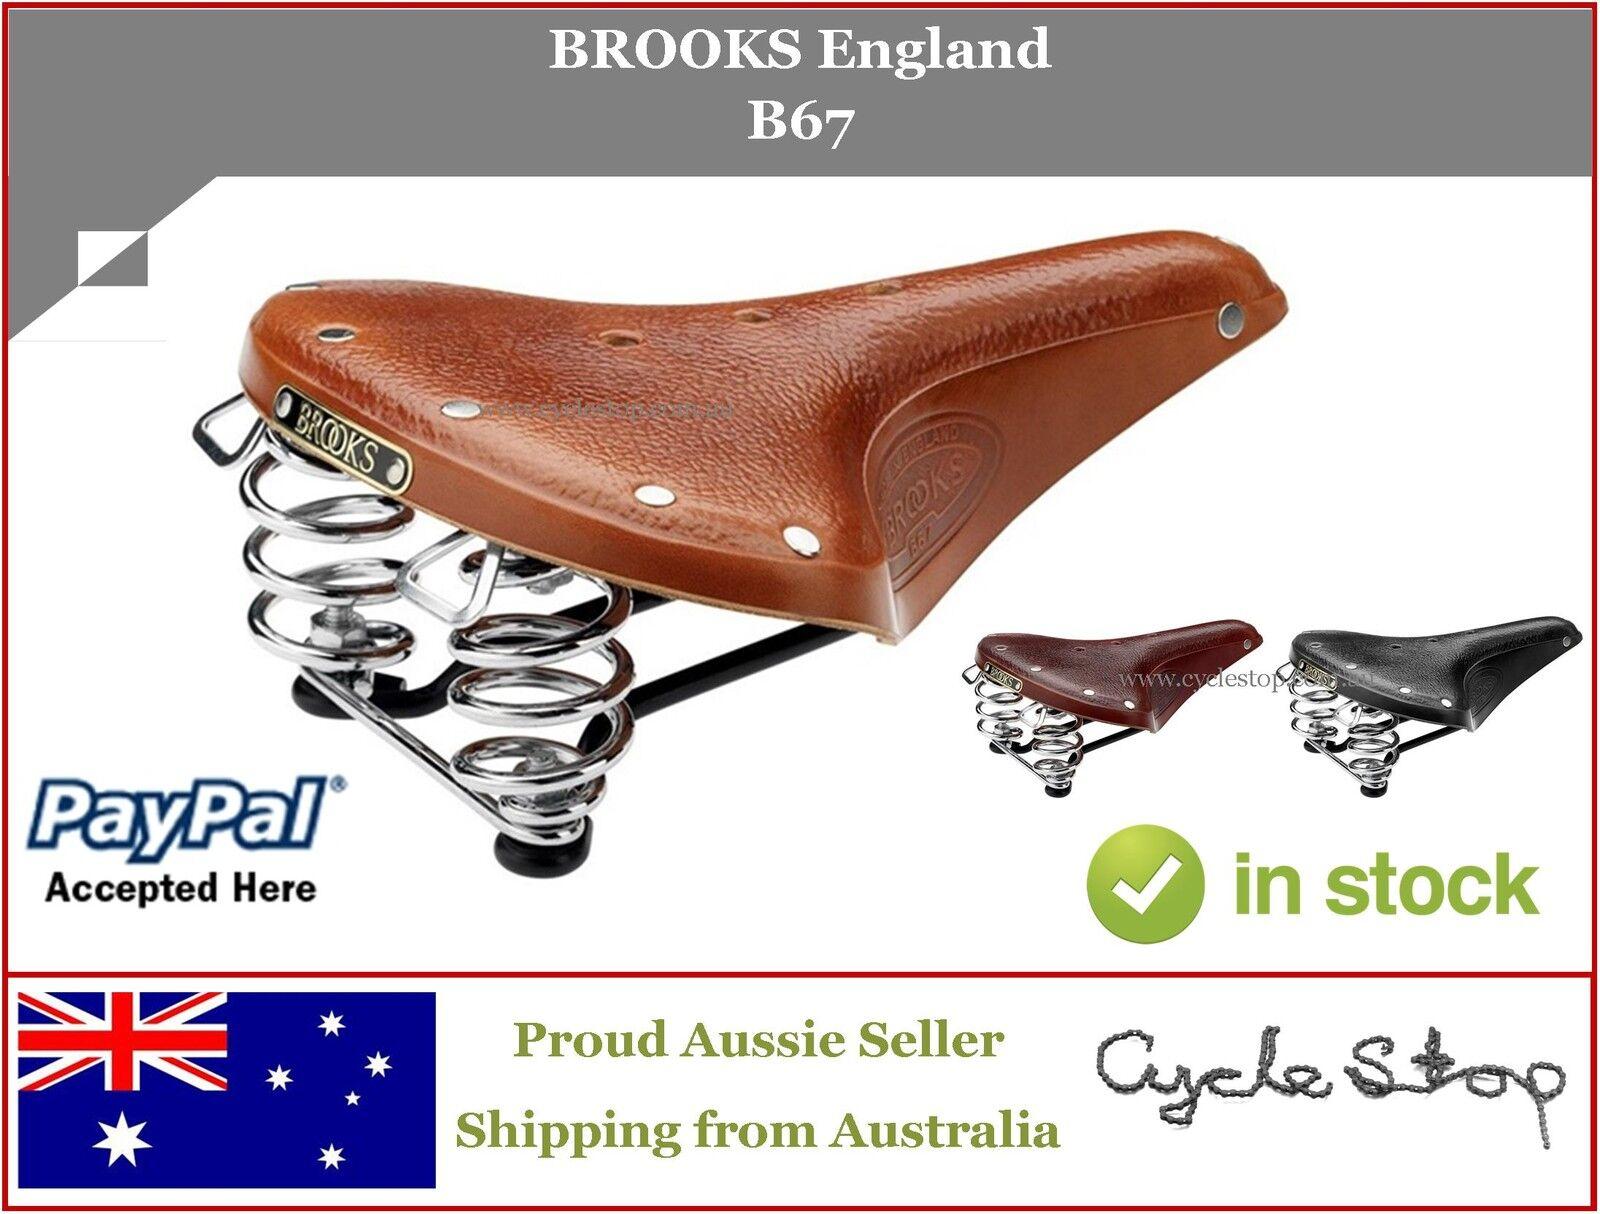 BIKE SEAT SPRUNG - BROOKS ENGLAND - B67 LEATHER SADDLE RETRO OLD SCHOOL STYLE